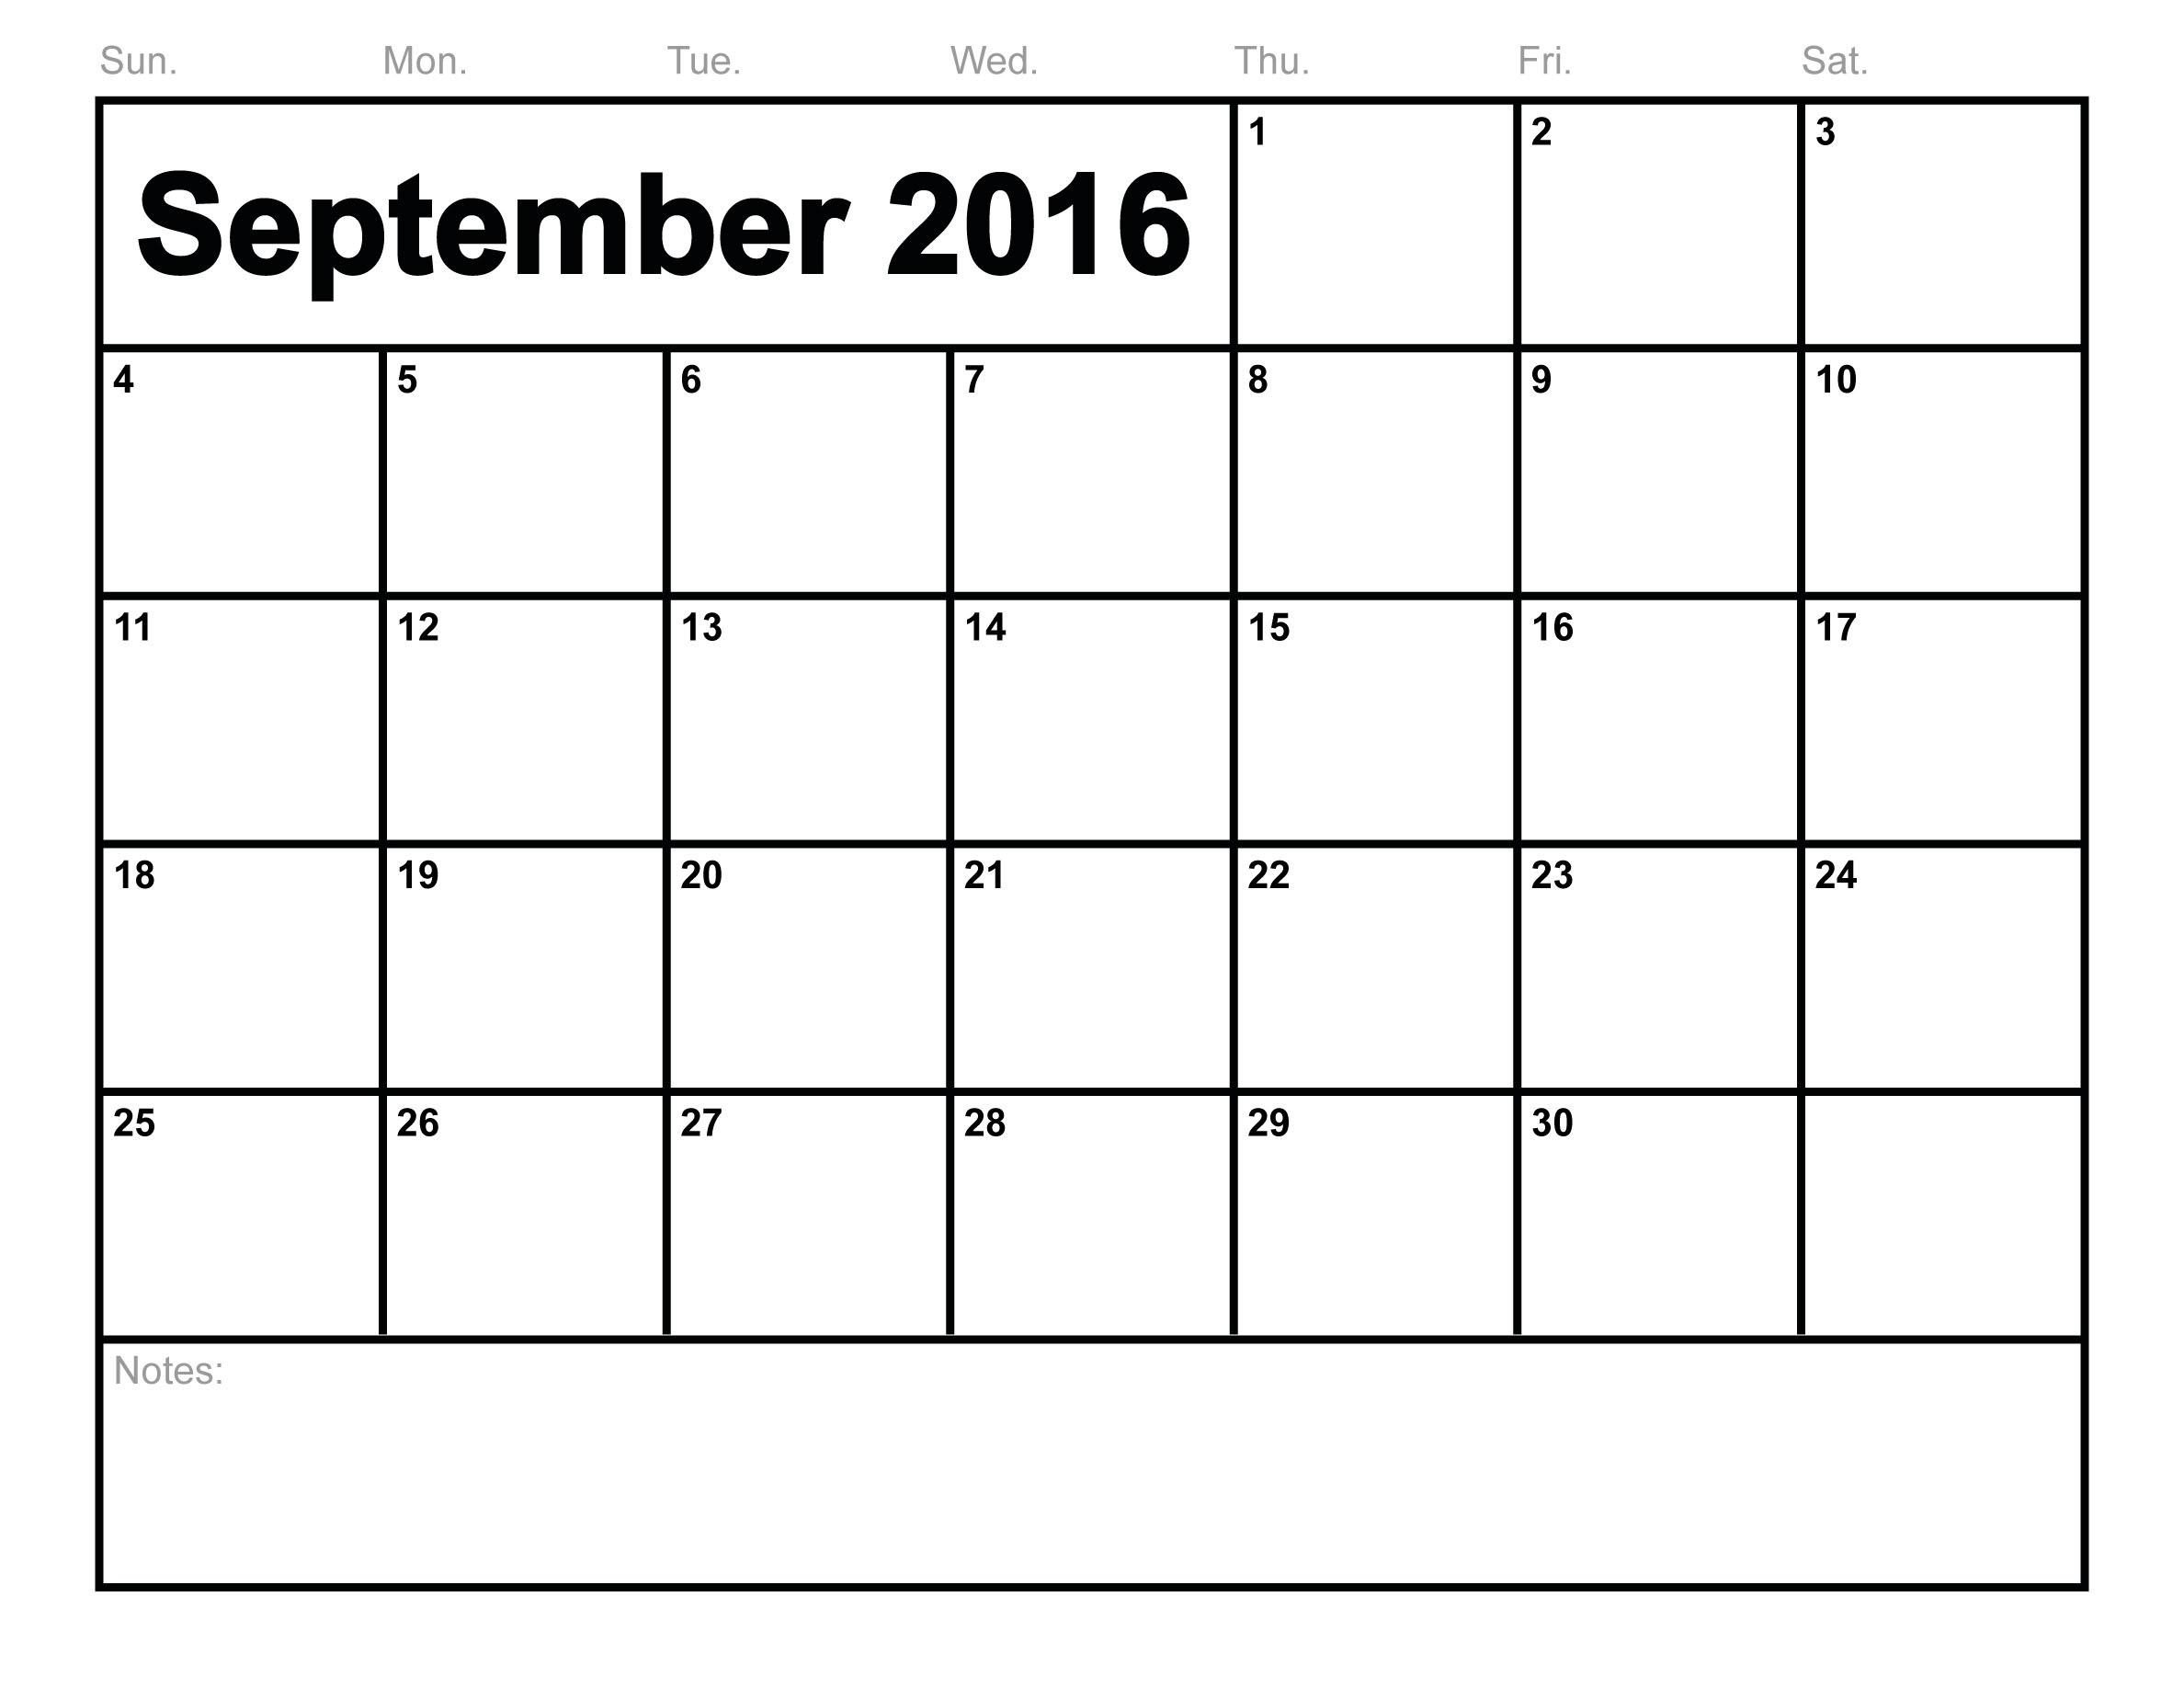 2018 September Printable Calendar Free, Blank Templates Pdf regarding Blank Monthly Calendar September